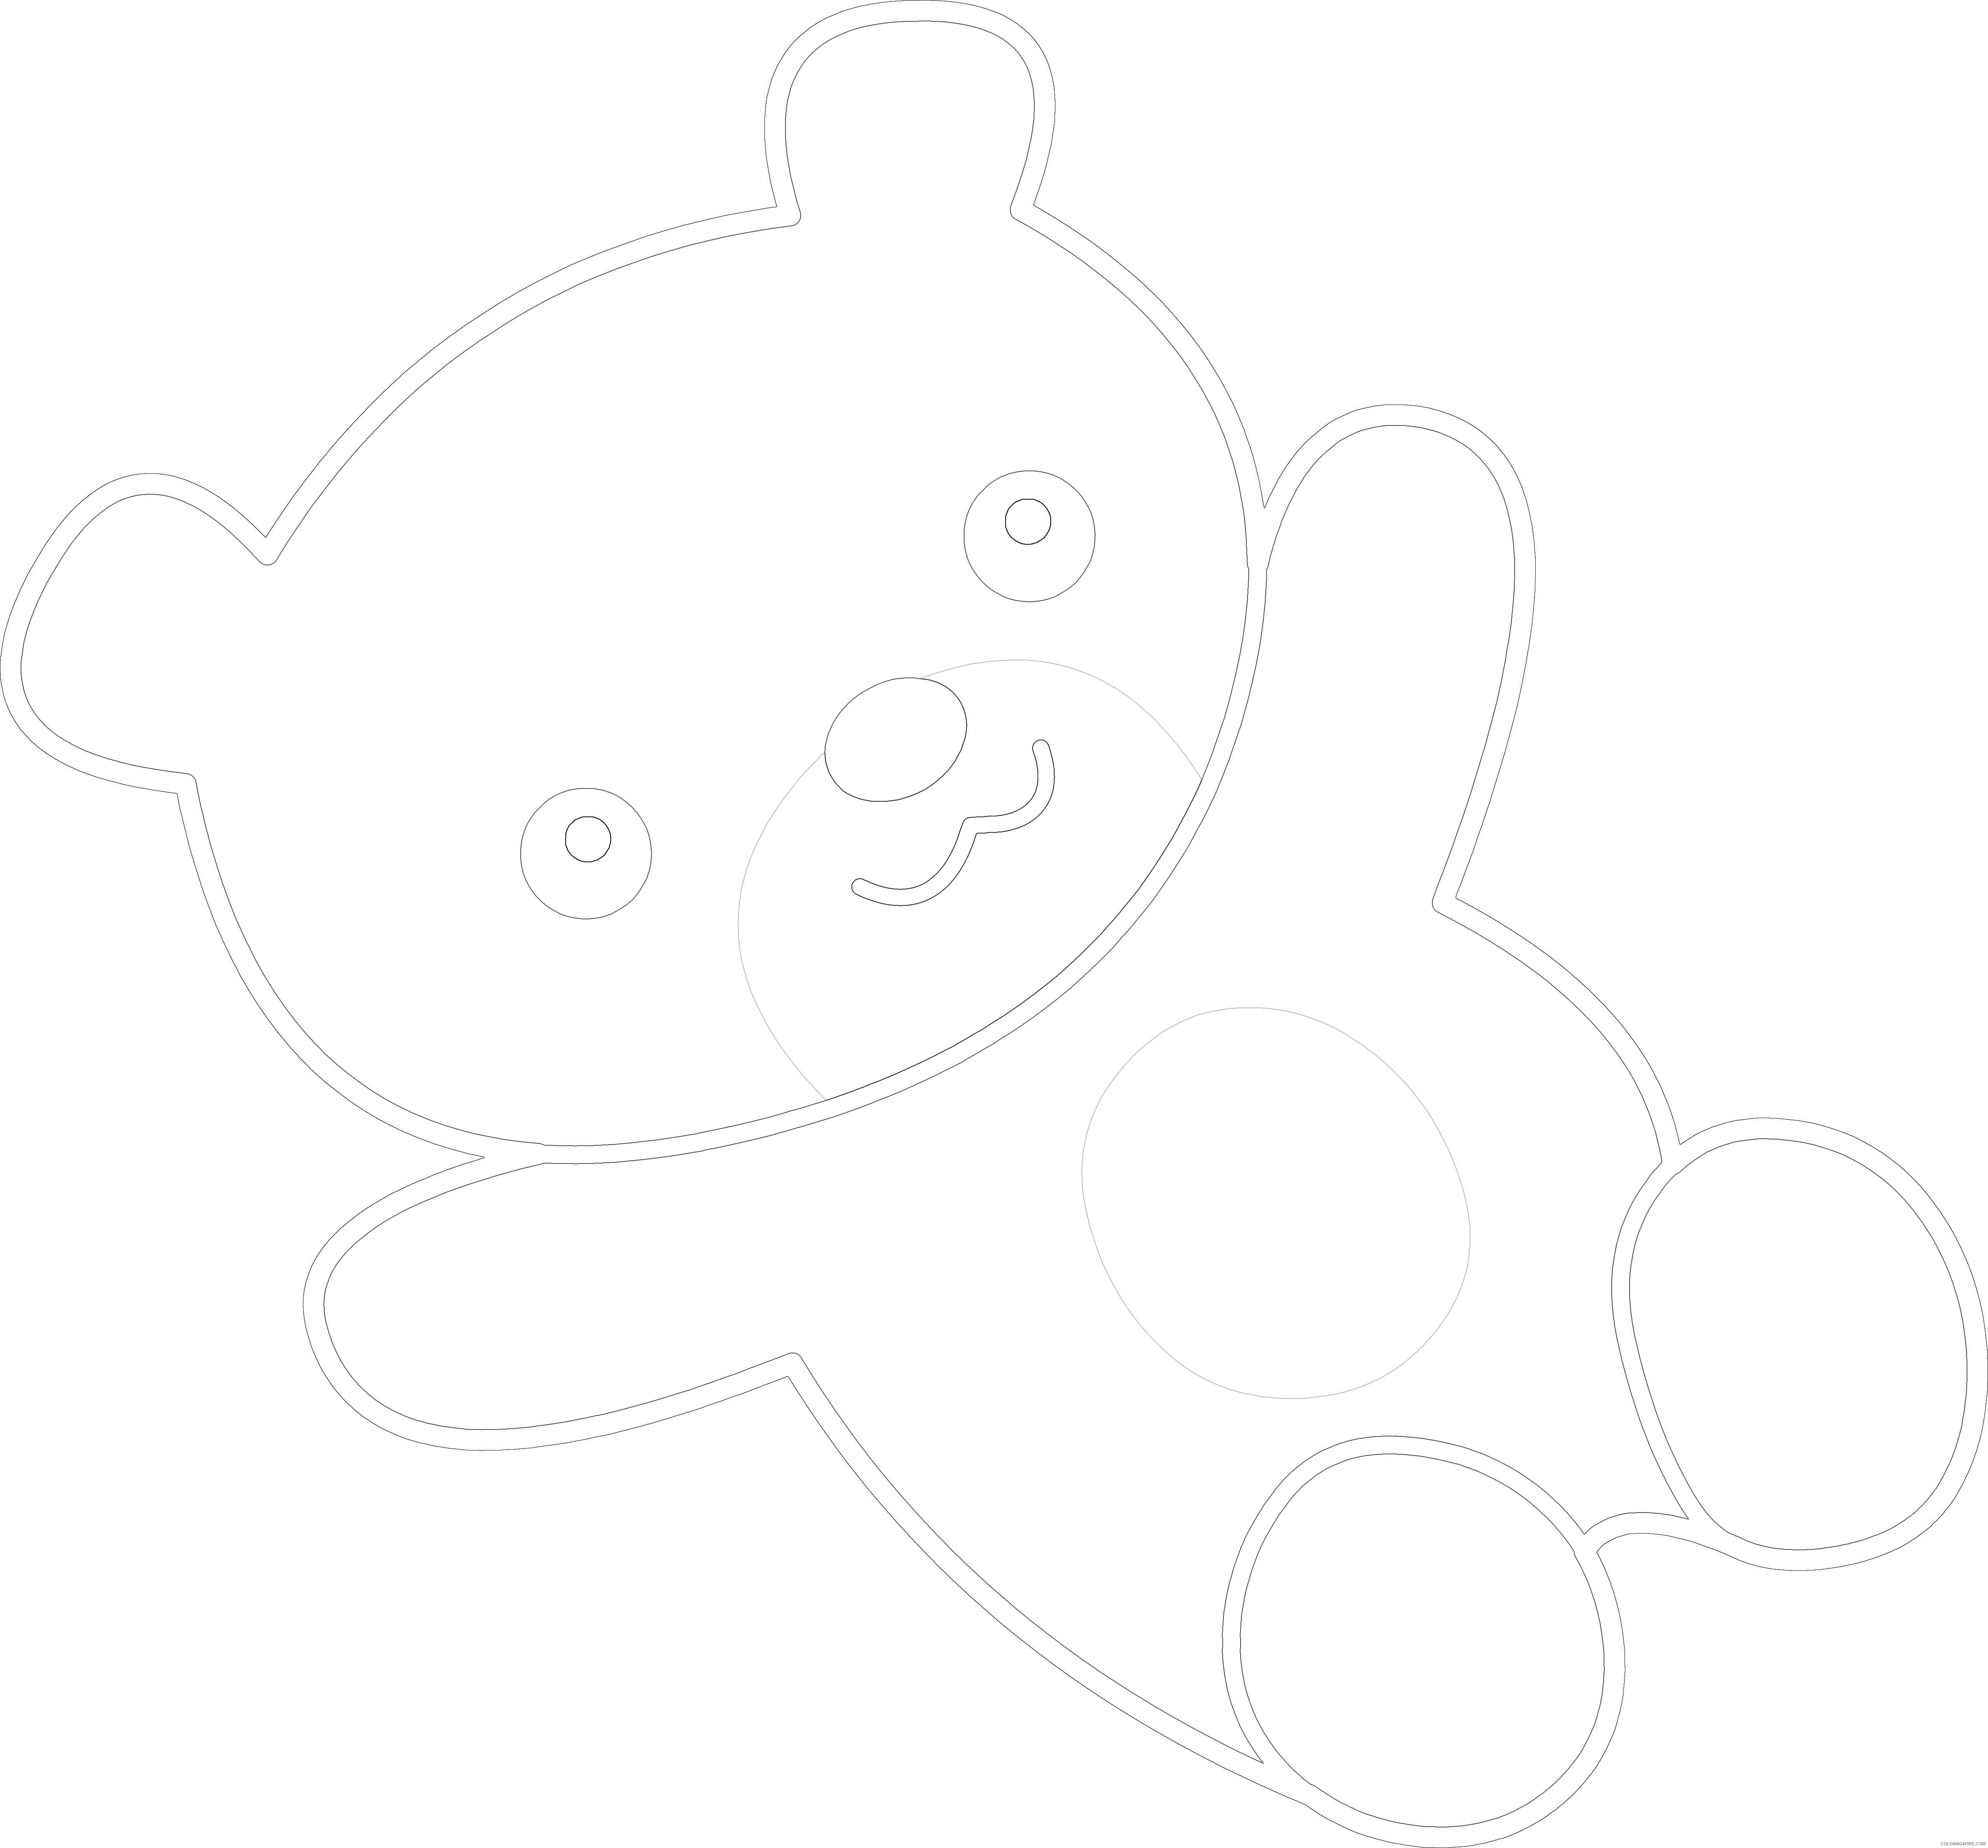 teddy bear 2 coloring